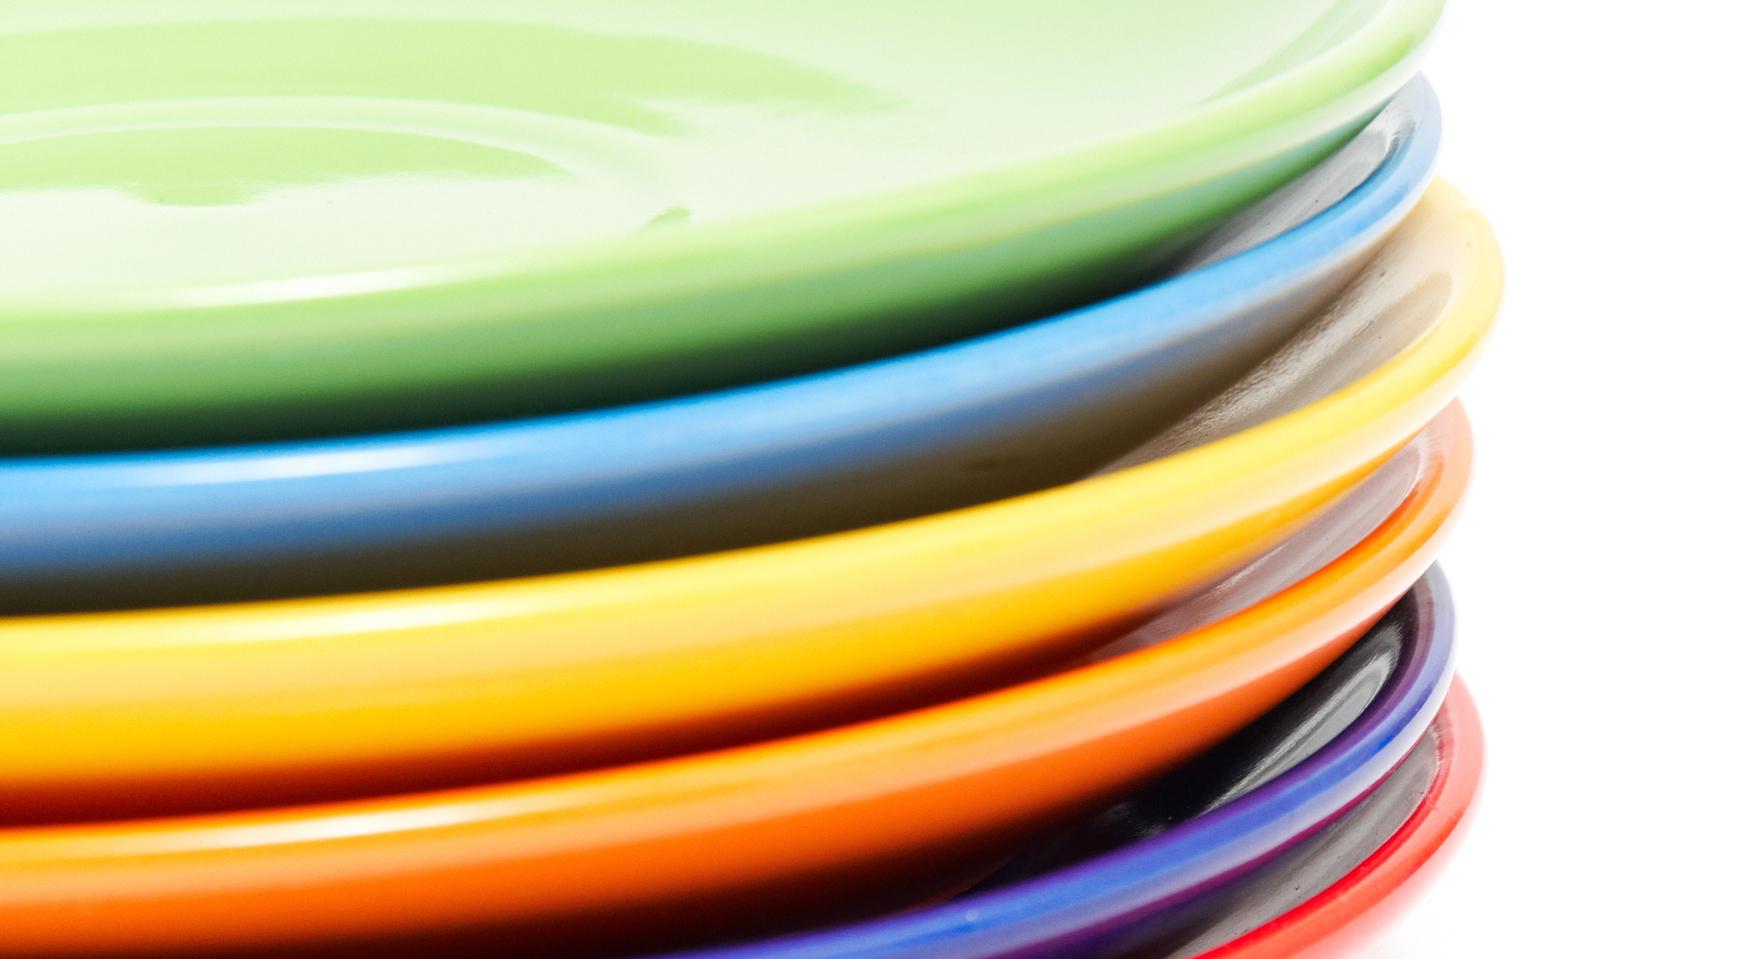 صور اطباق وصحون تقديم ملونة وسادة مودرن شيك (4)